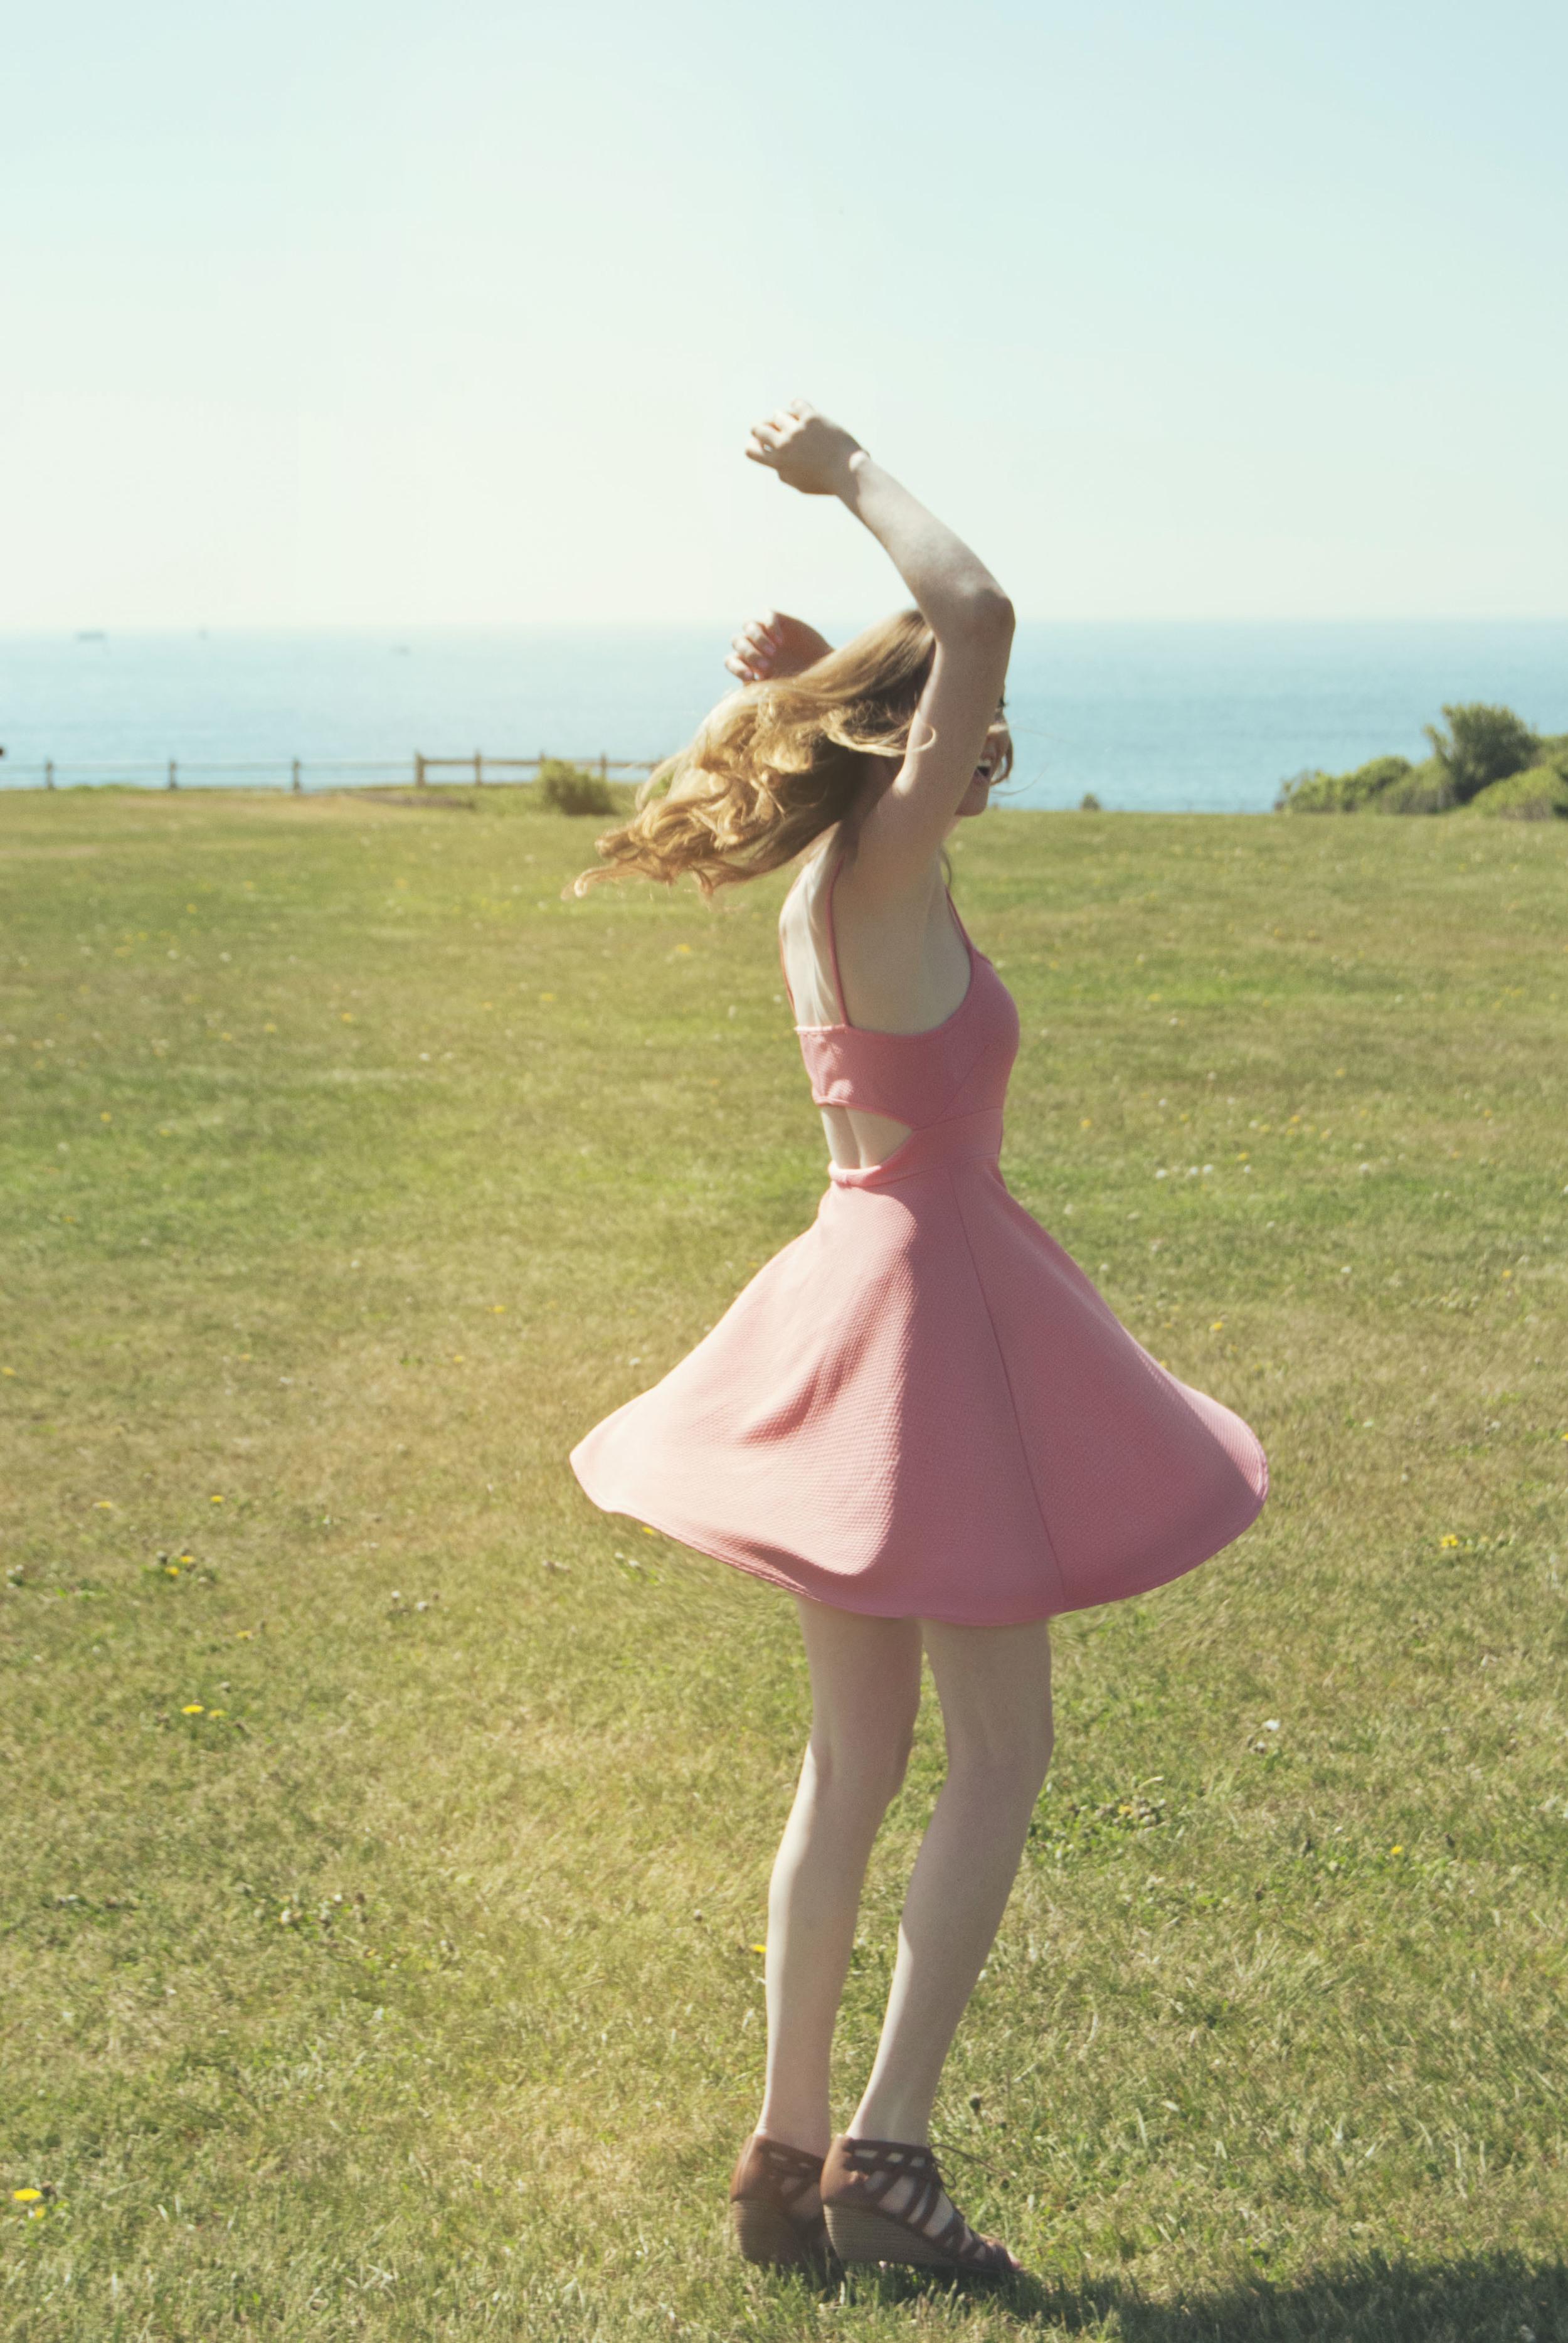 Spinning | Girl x Garment